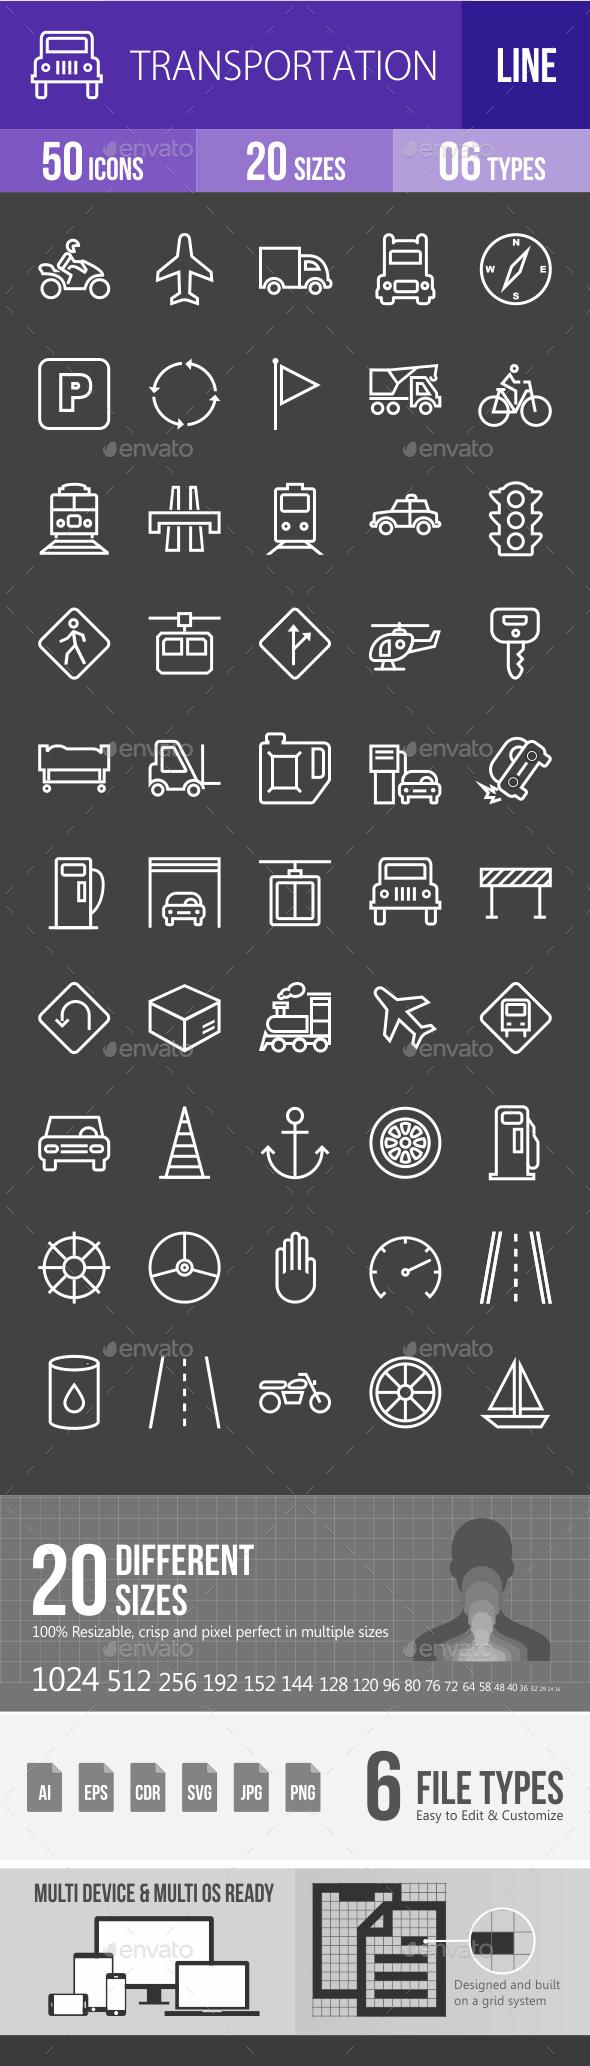 Transportatiom Line Inverted Icons - Icons